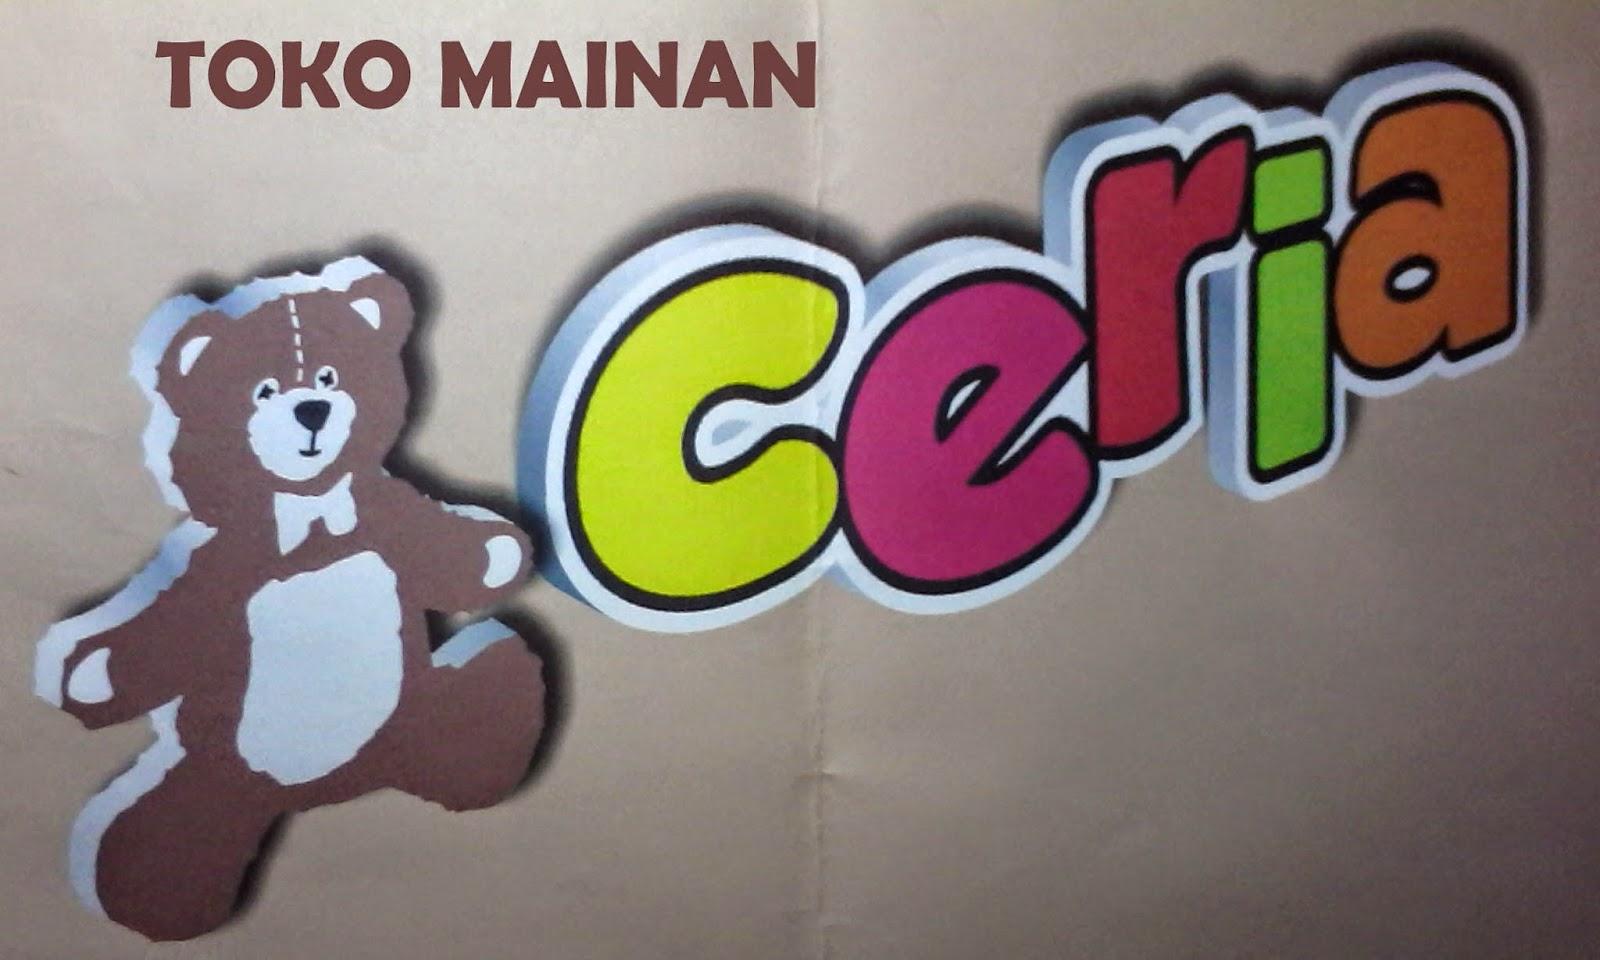 Lowongan Kerja Pramuniaga dan Sopir di Toko Mainan Ceria – Semarang